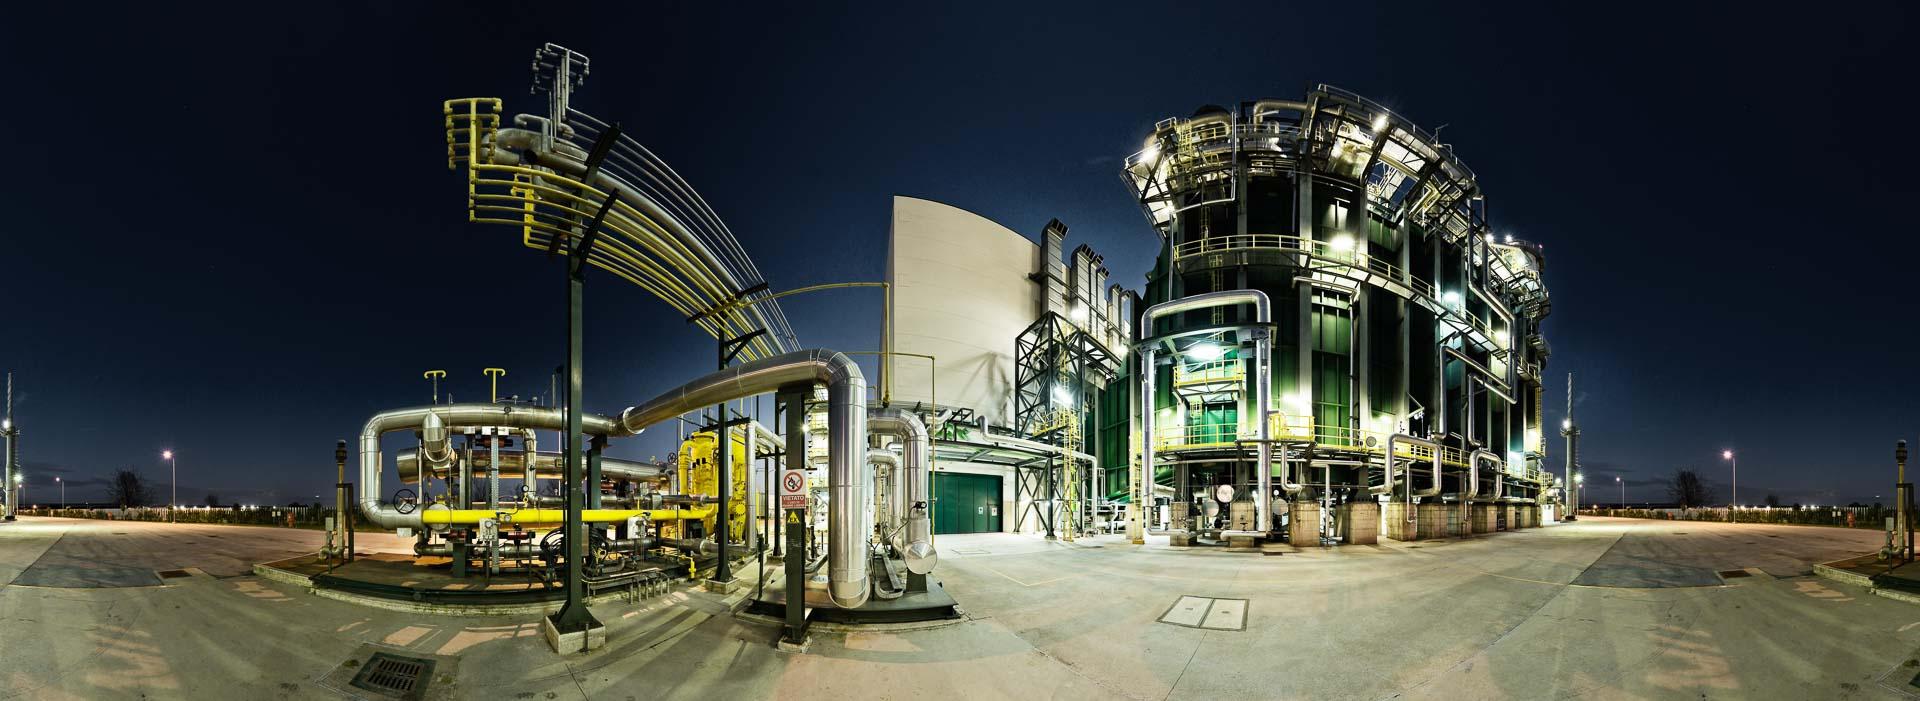 Gas Industrie blaue Stunde– 360° Foto